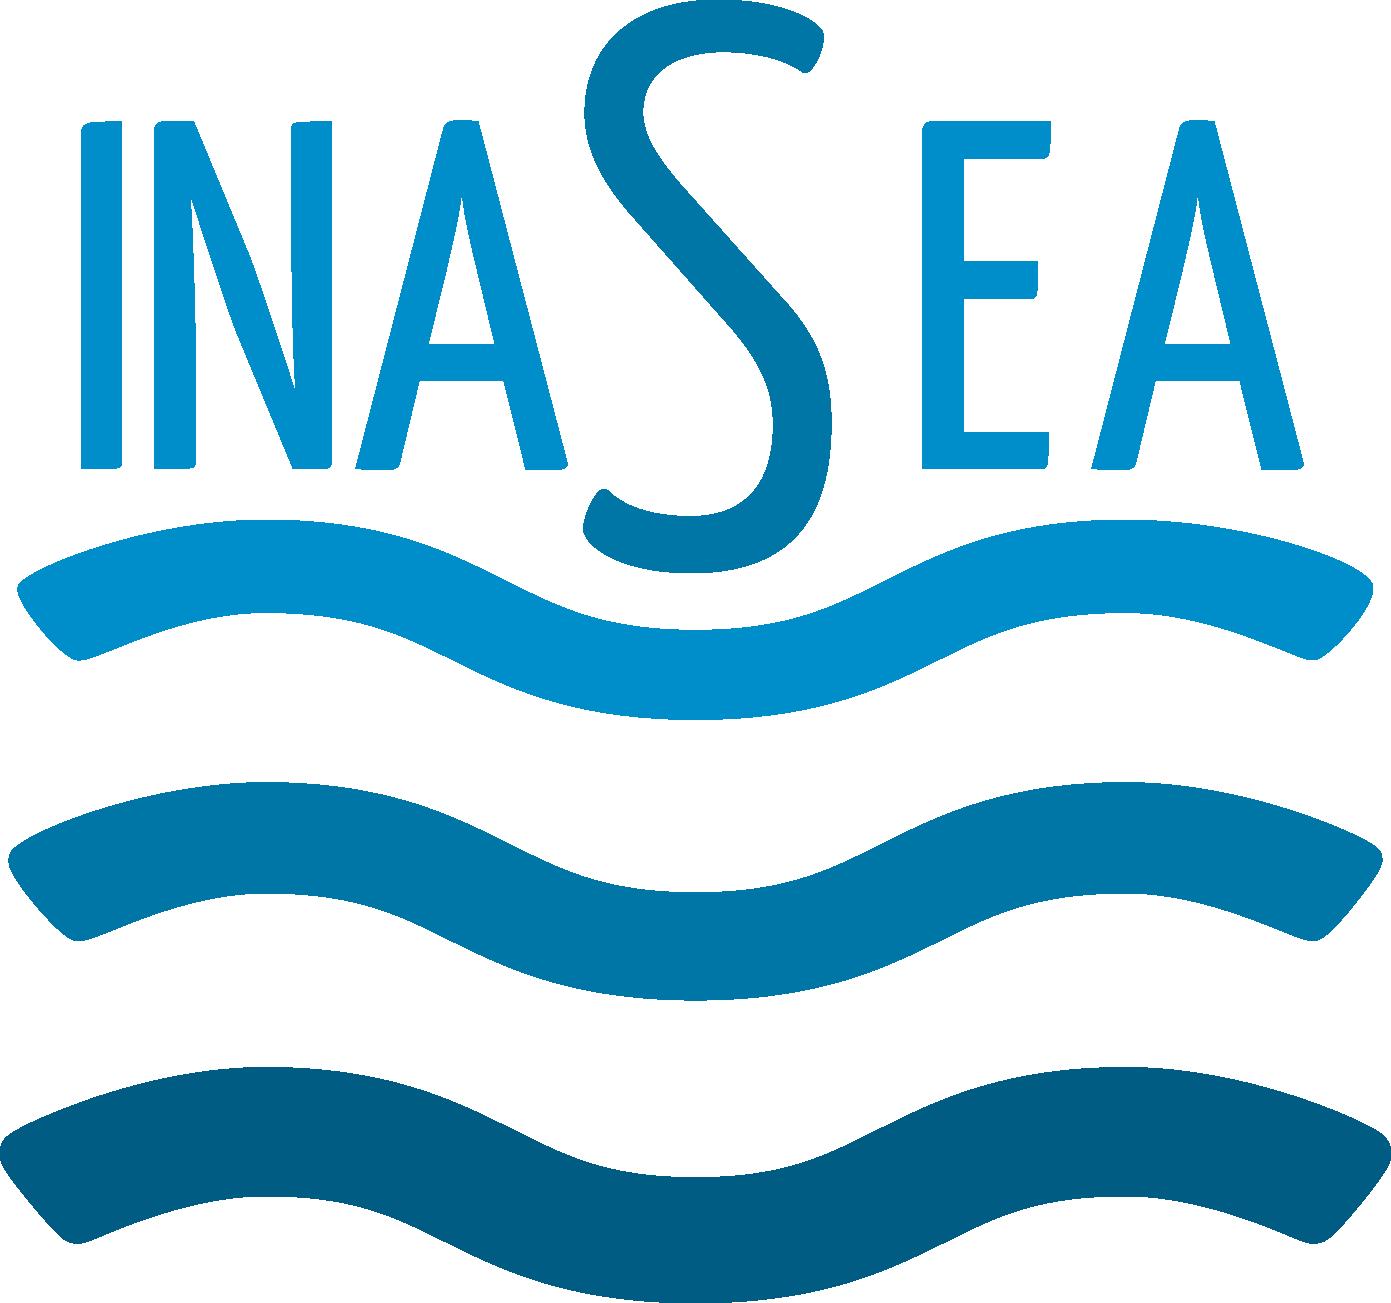 INASEA goes birding